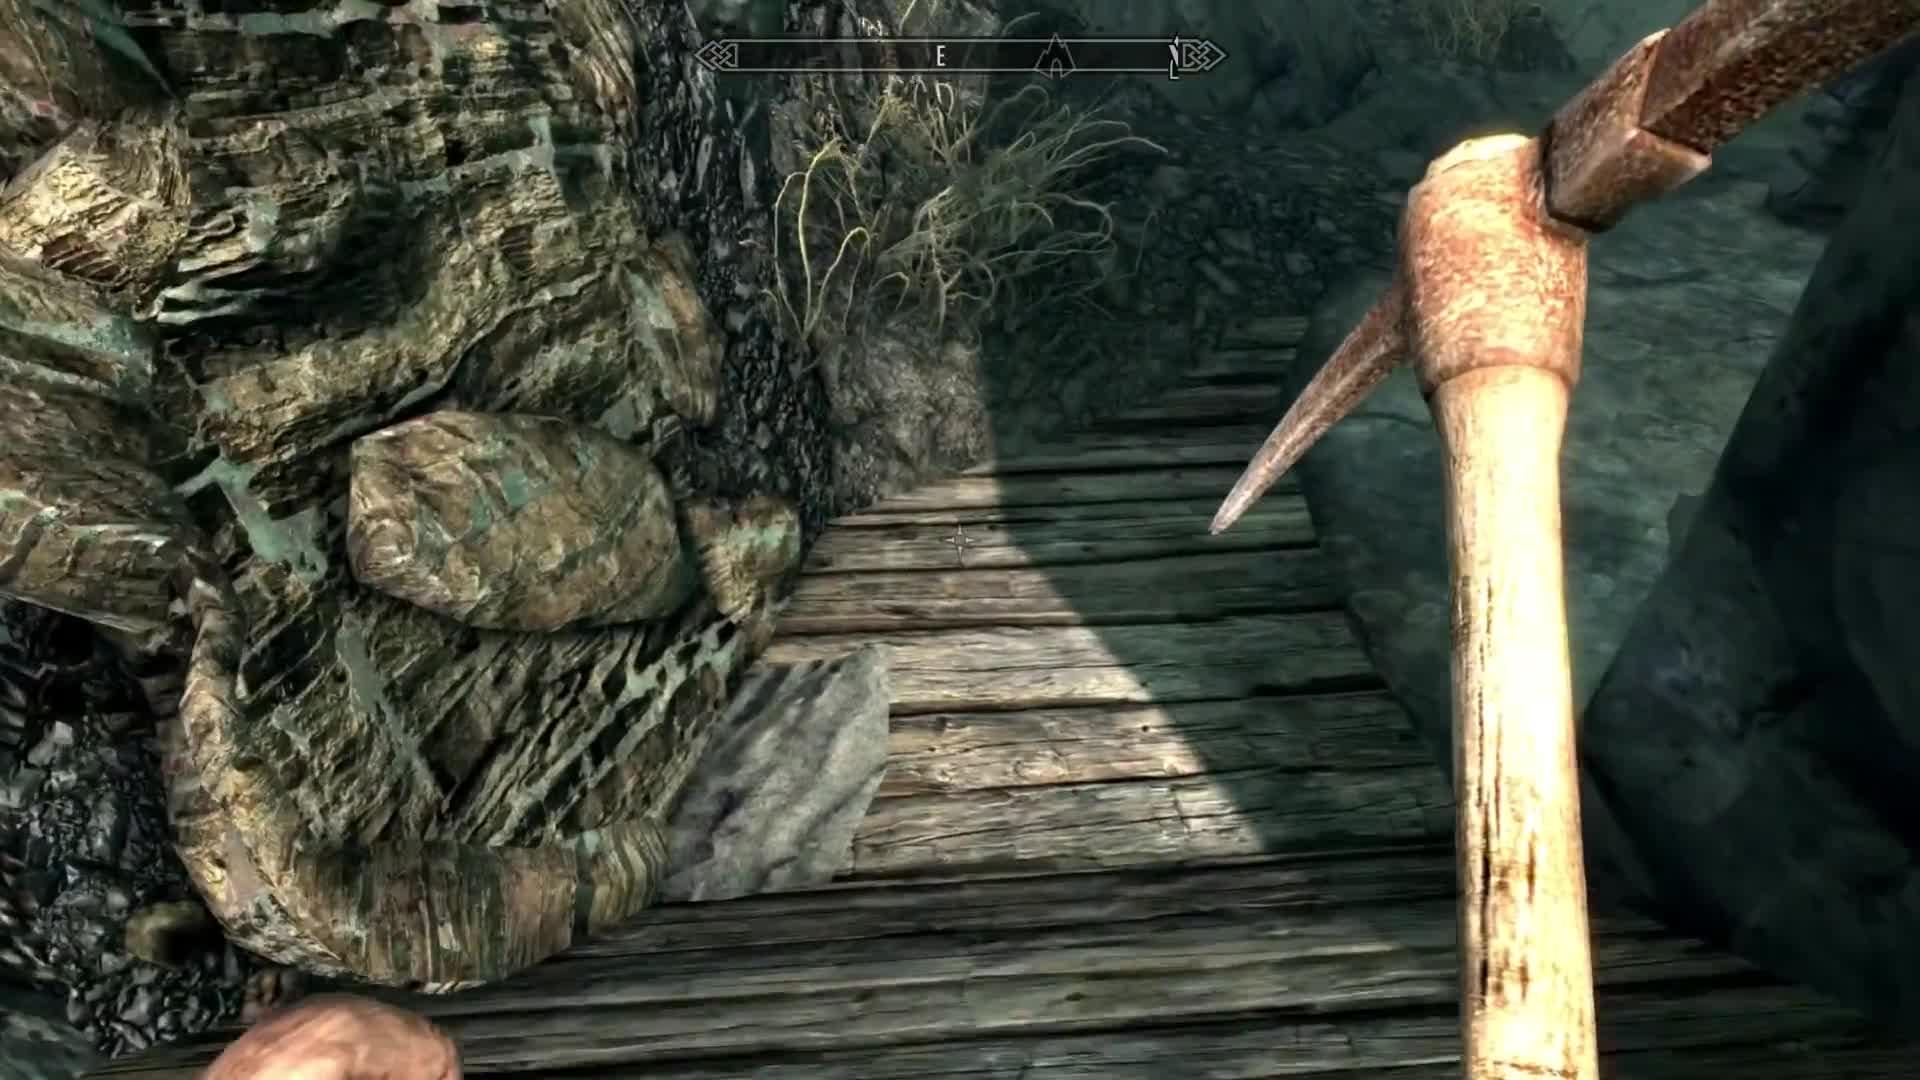 Bethesda, Elder Scrolls, Skyrim, bad, mine, mining, ore, pickaxe, sluggish, sucks, Why Skyrim's Mining Animation Is Bad - New Frame Plus GIFs